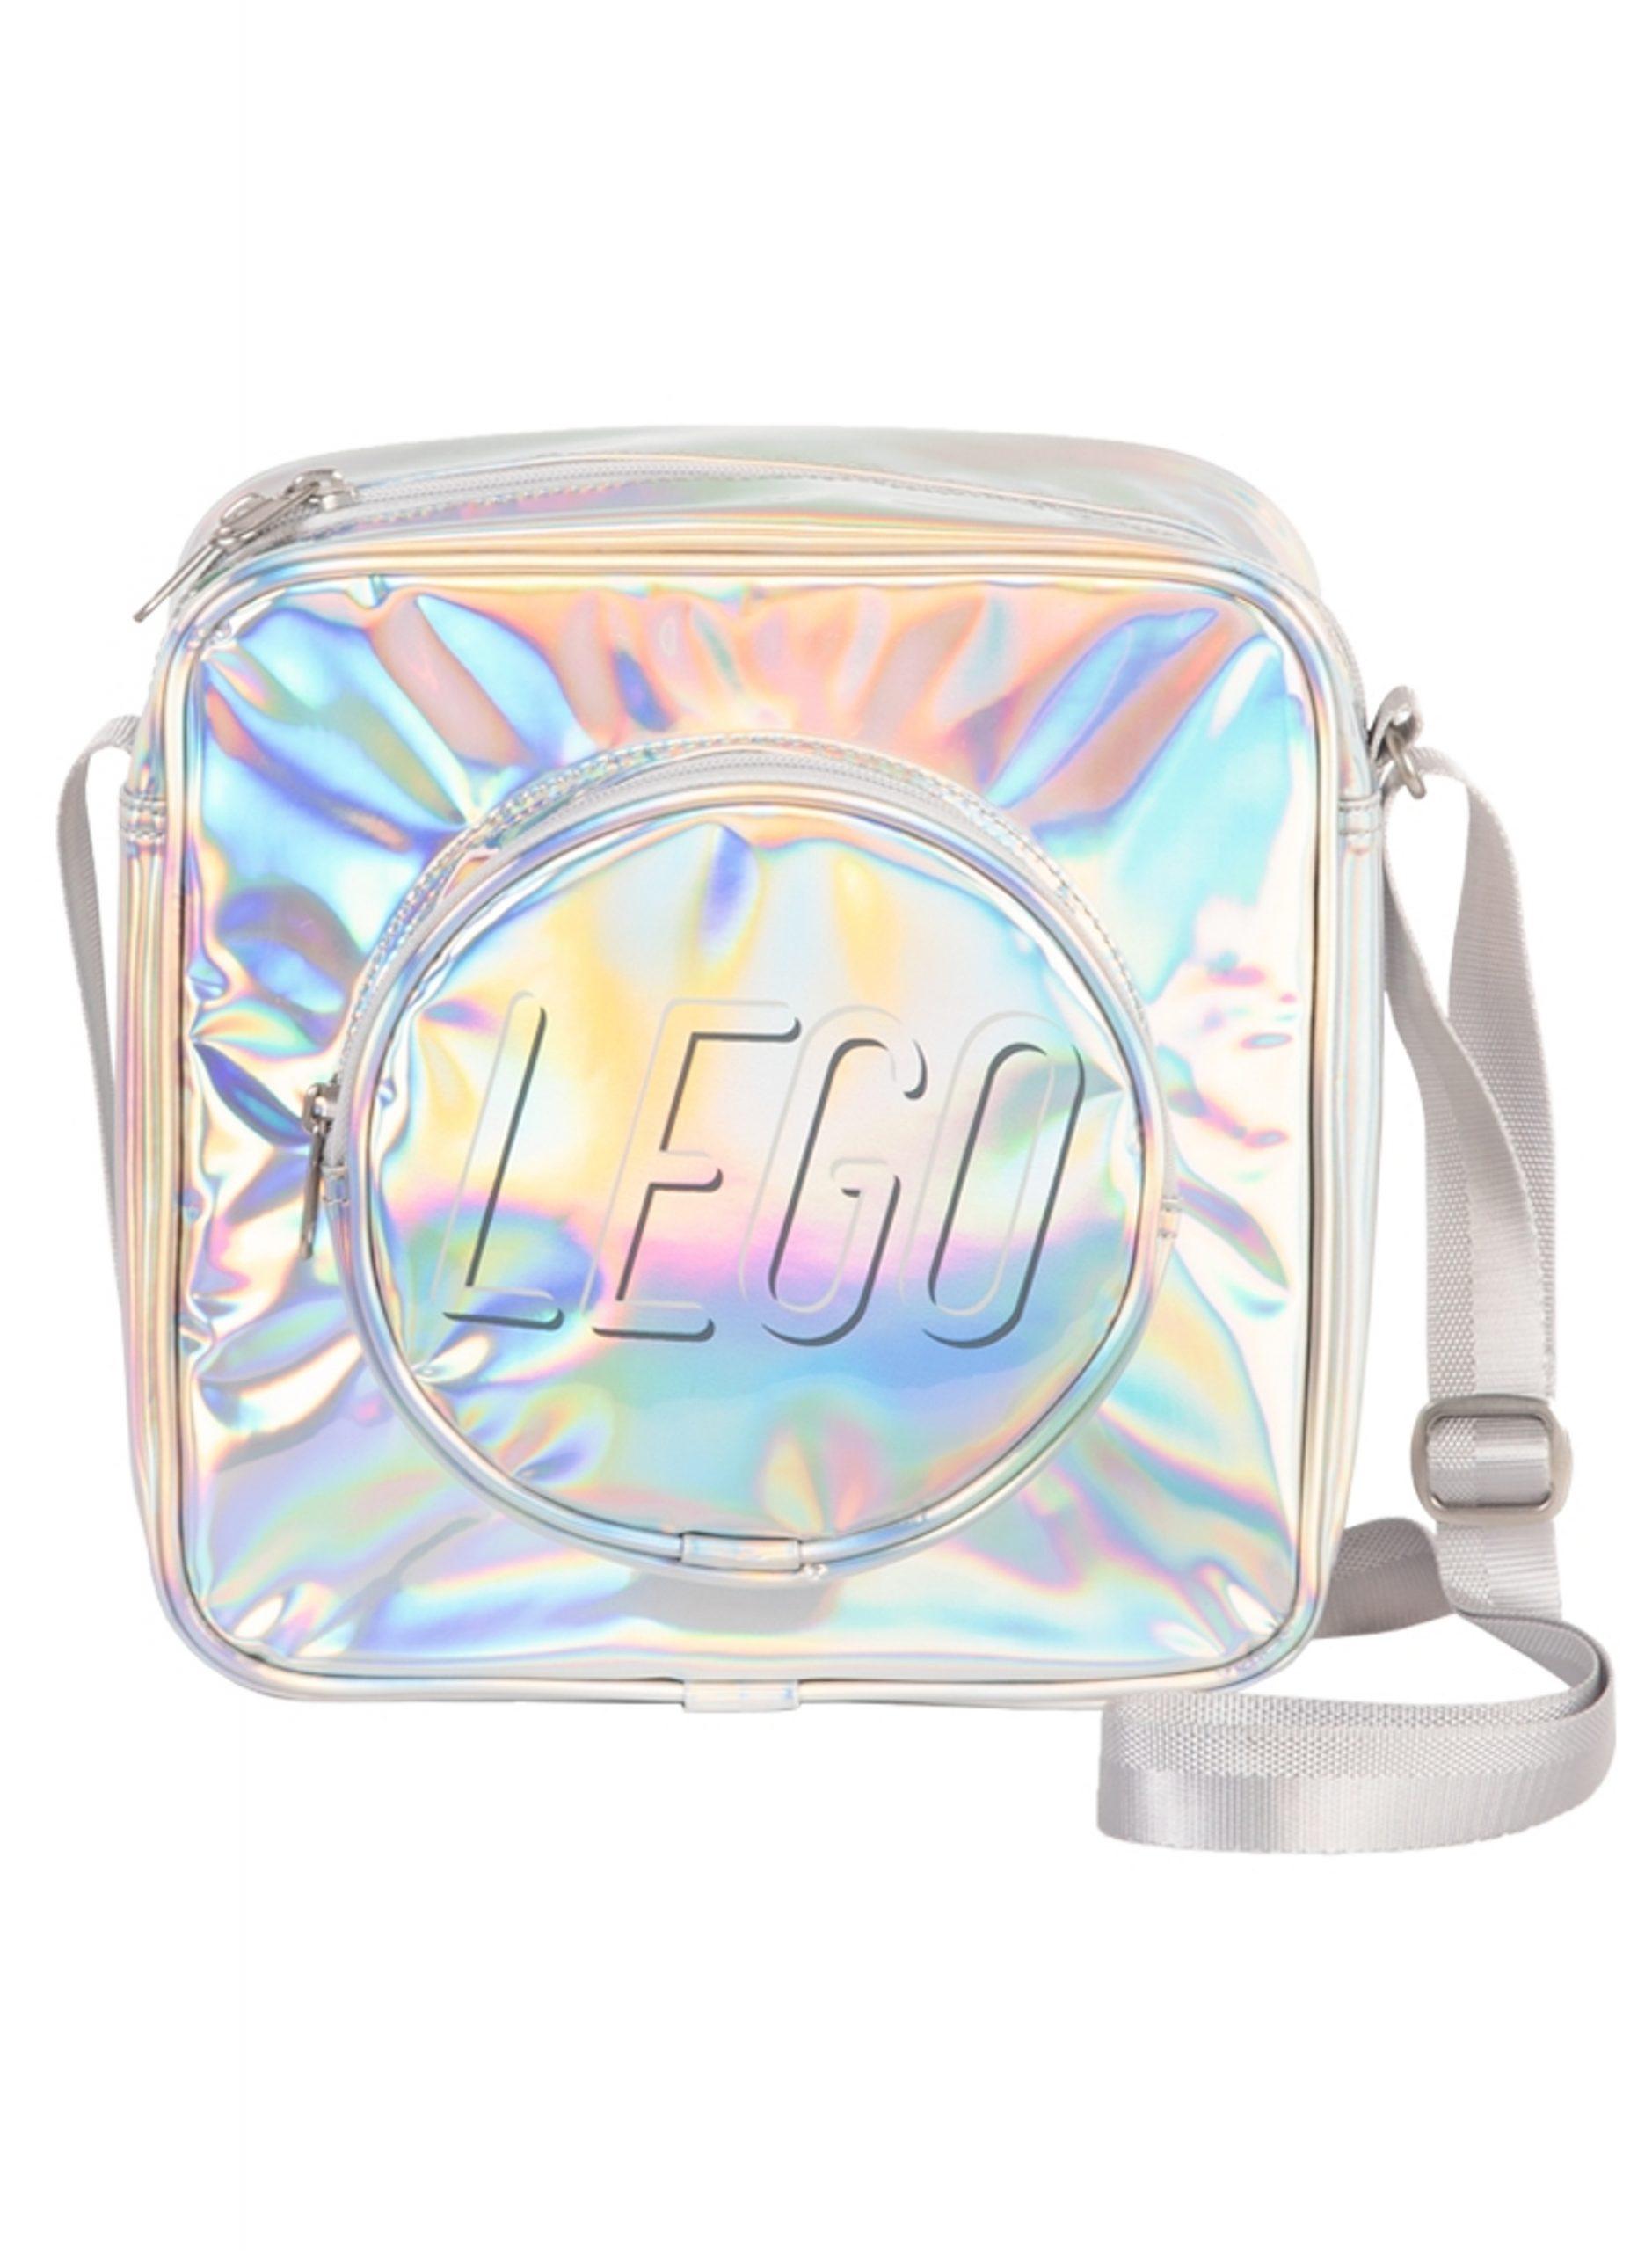 Lego 5005810 Sale Holographic Brick Crossbody Bag 65 00 Lowest Price